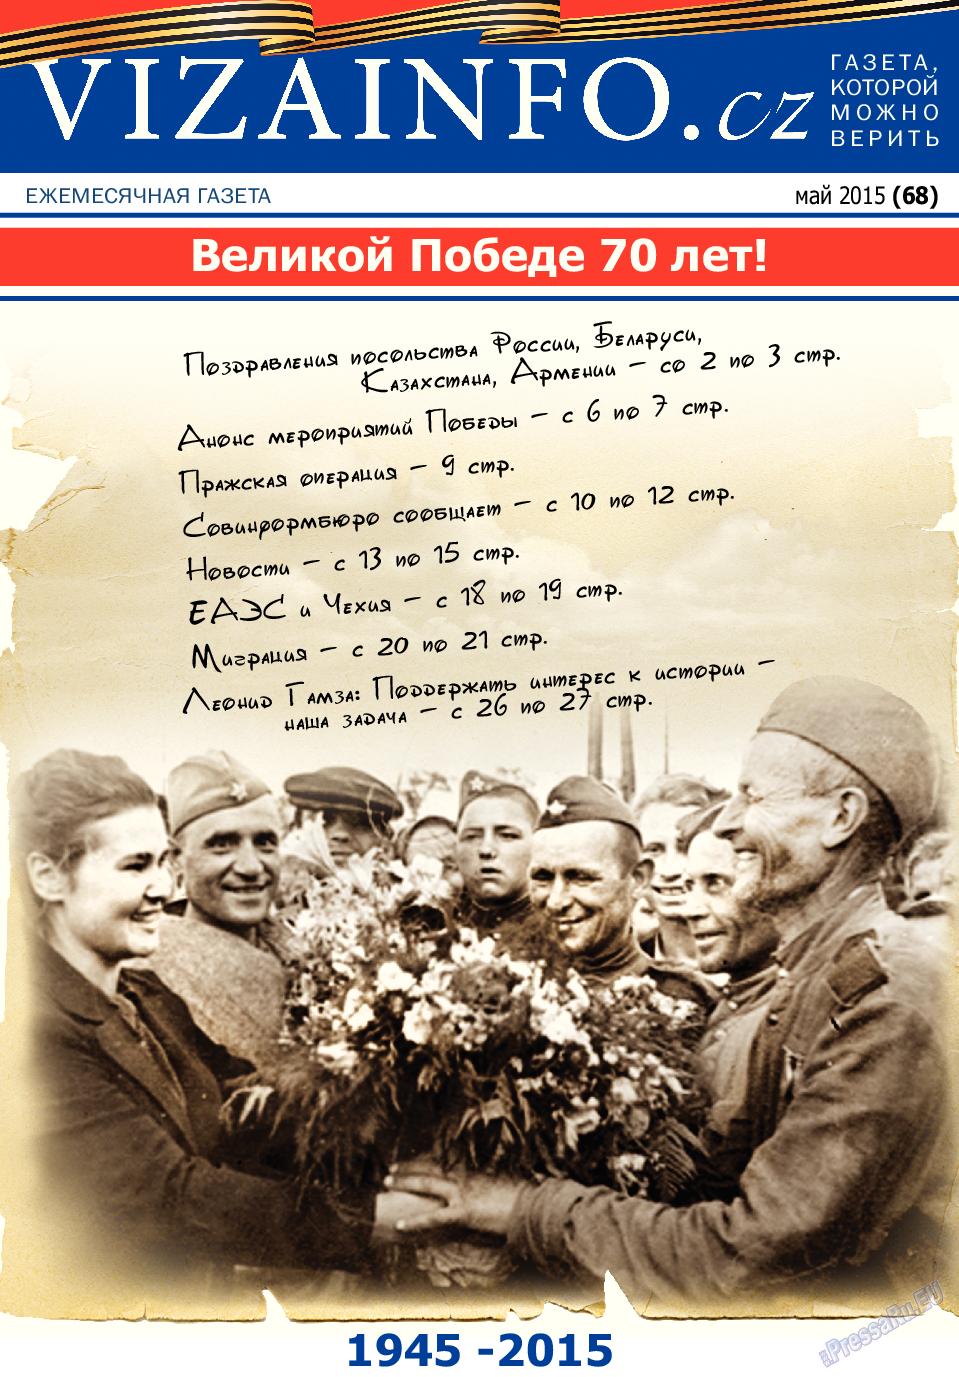 Vizainfo.cz (газета). 2015 год, номер 68, стр. 1